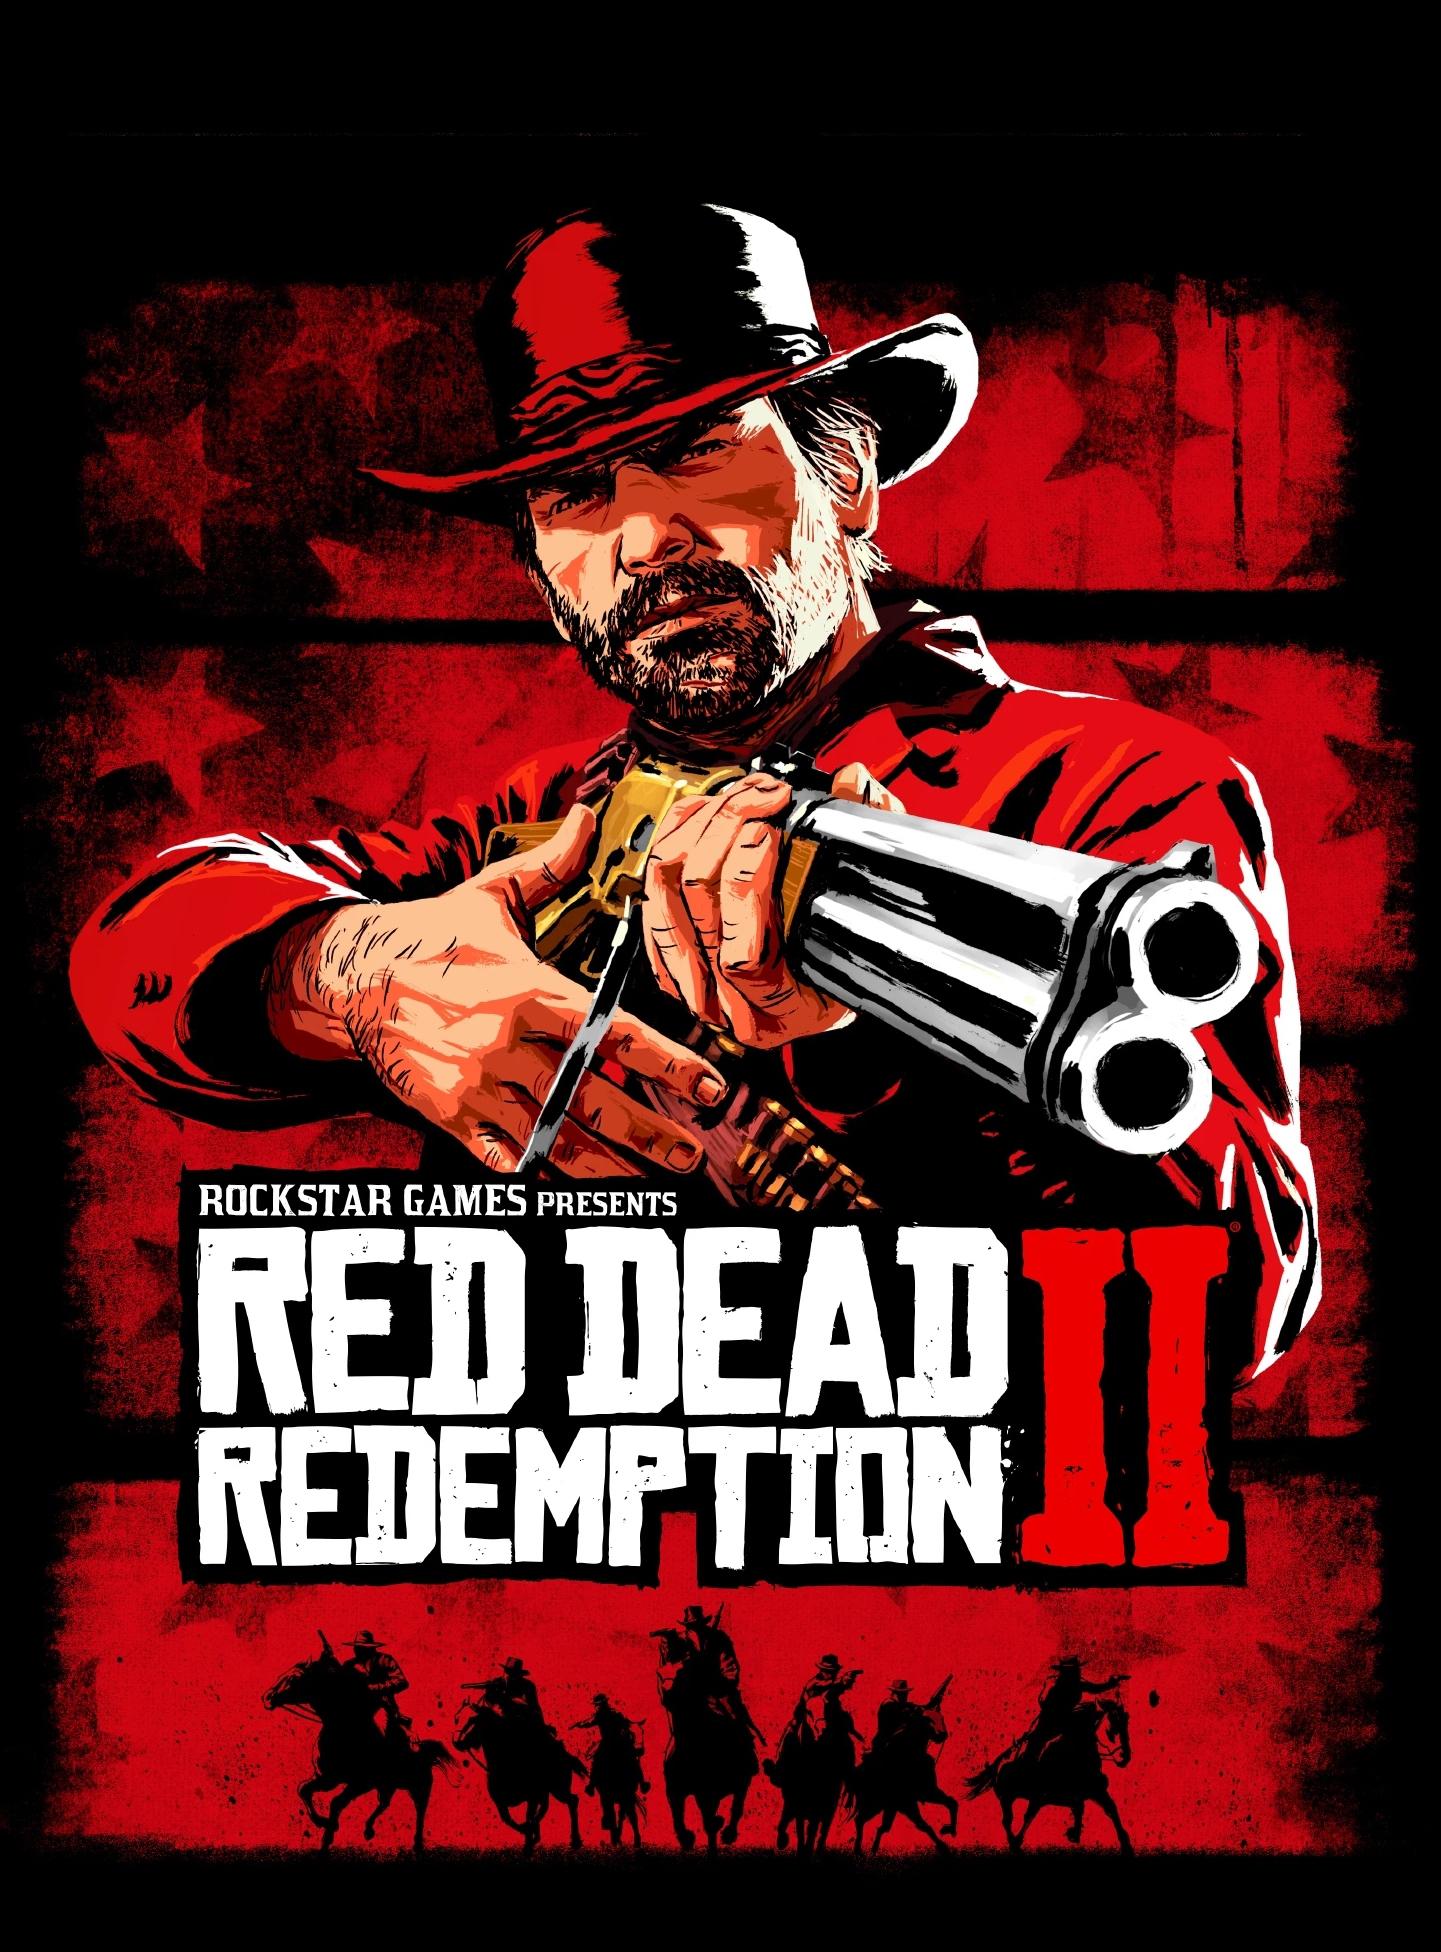 Red Dead Redemption 2 [PC][Epic Games] Hasta las 17:00